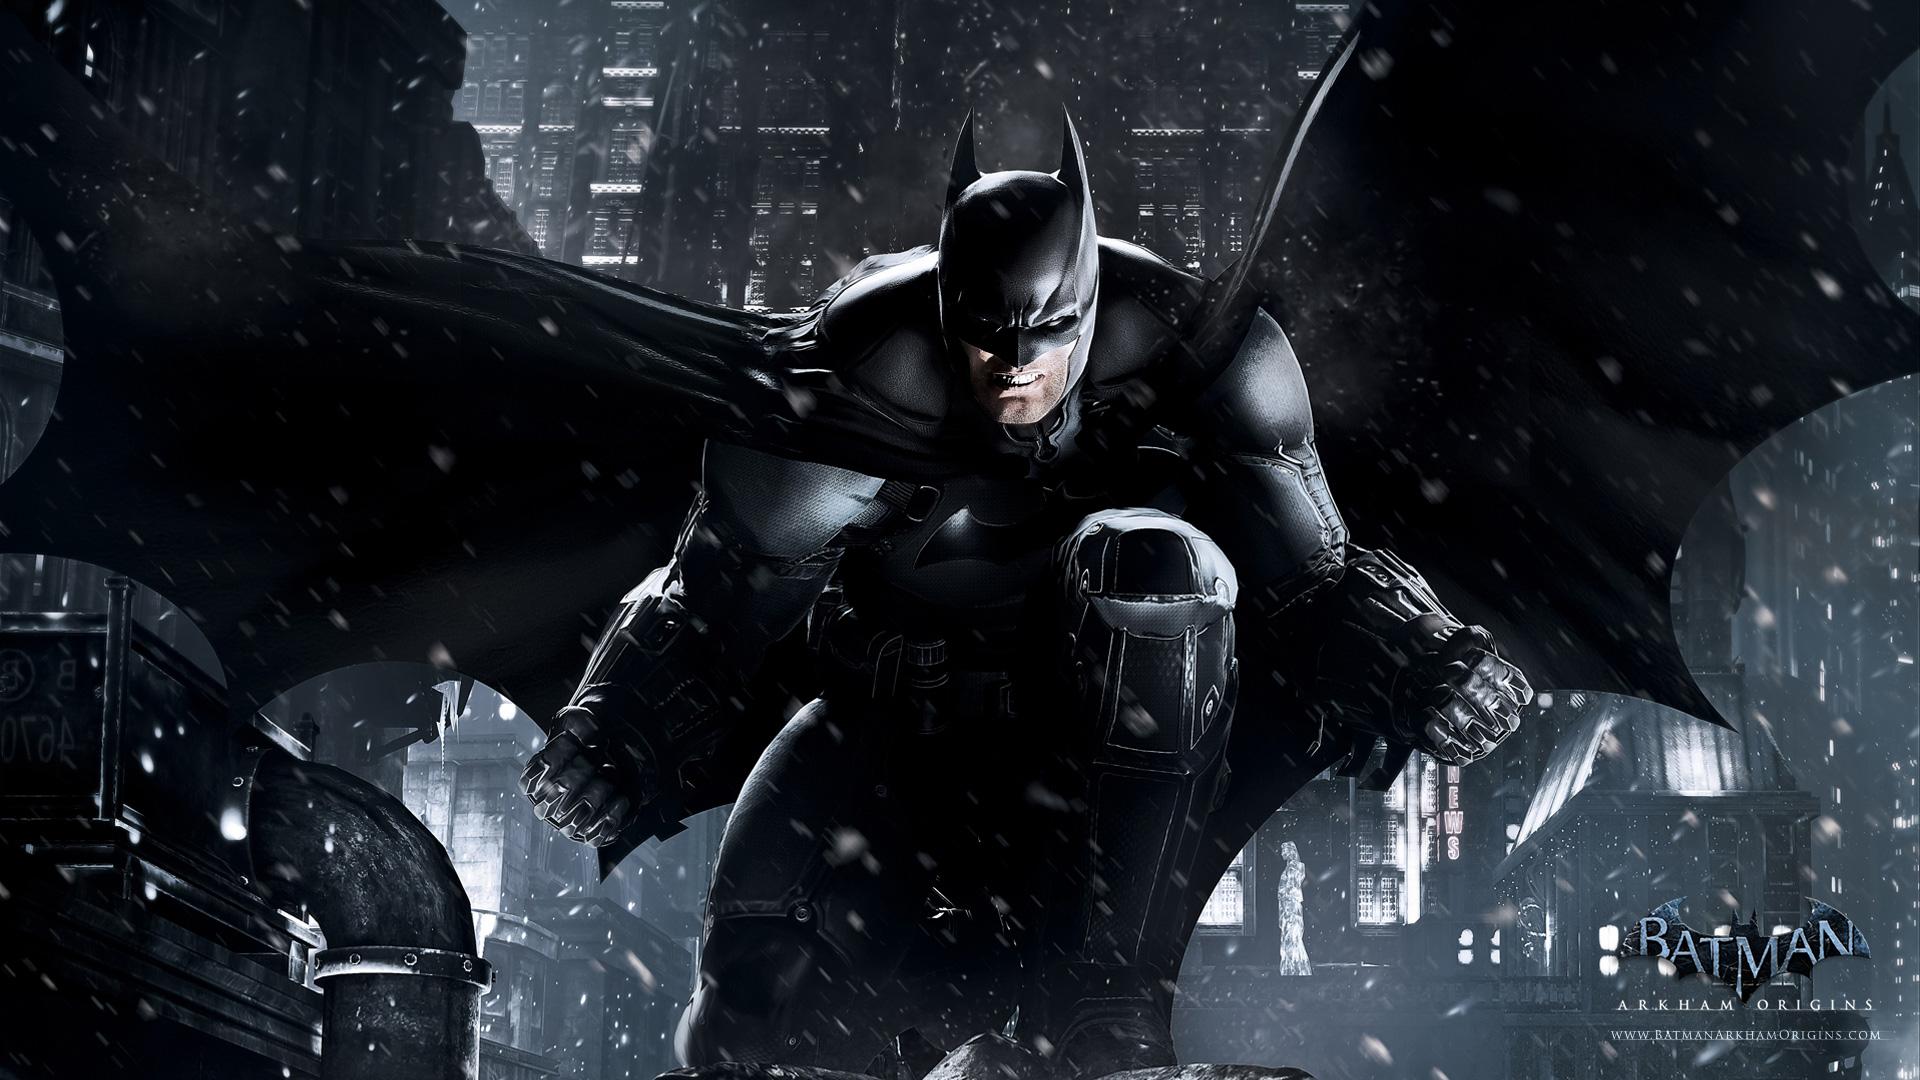 New Batman Arkham Origins Images emerge online   Lightning Gaming News 1920x1080